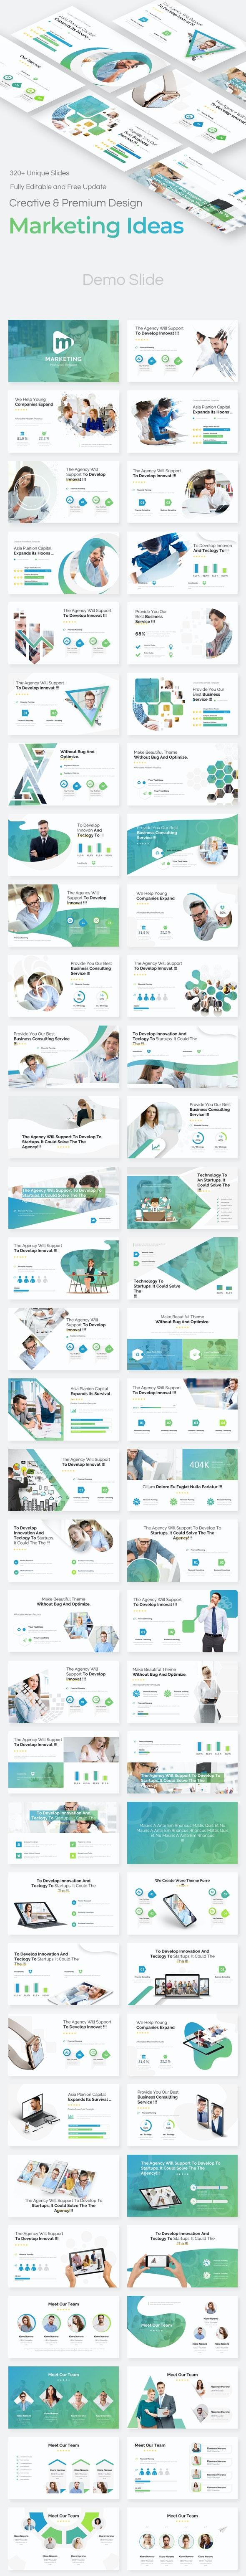 Marketing Ideas Pitch Deck Powerpoint Template - Business PowerPoint Templates